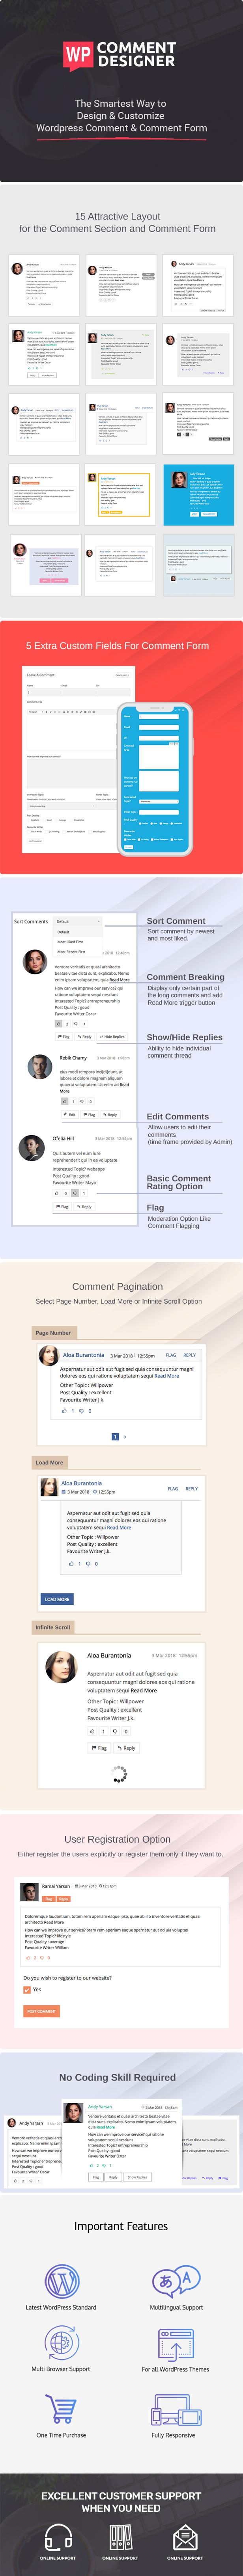 WP Comment Designer